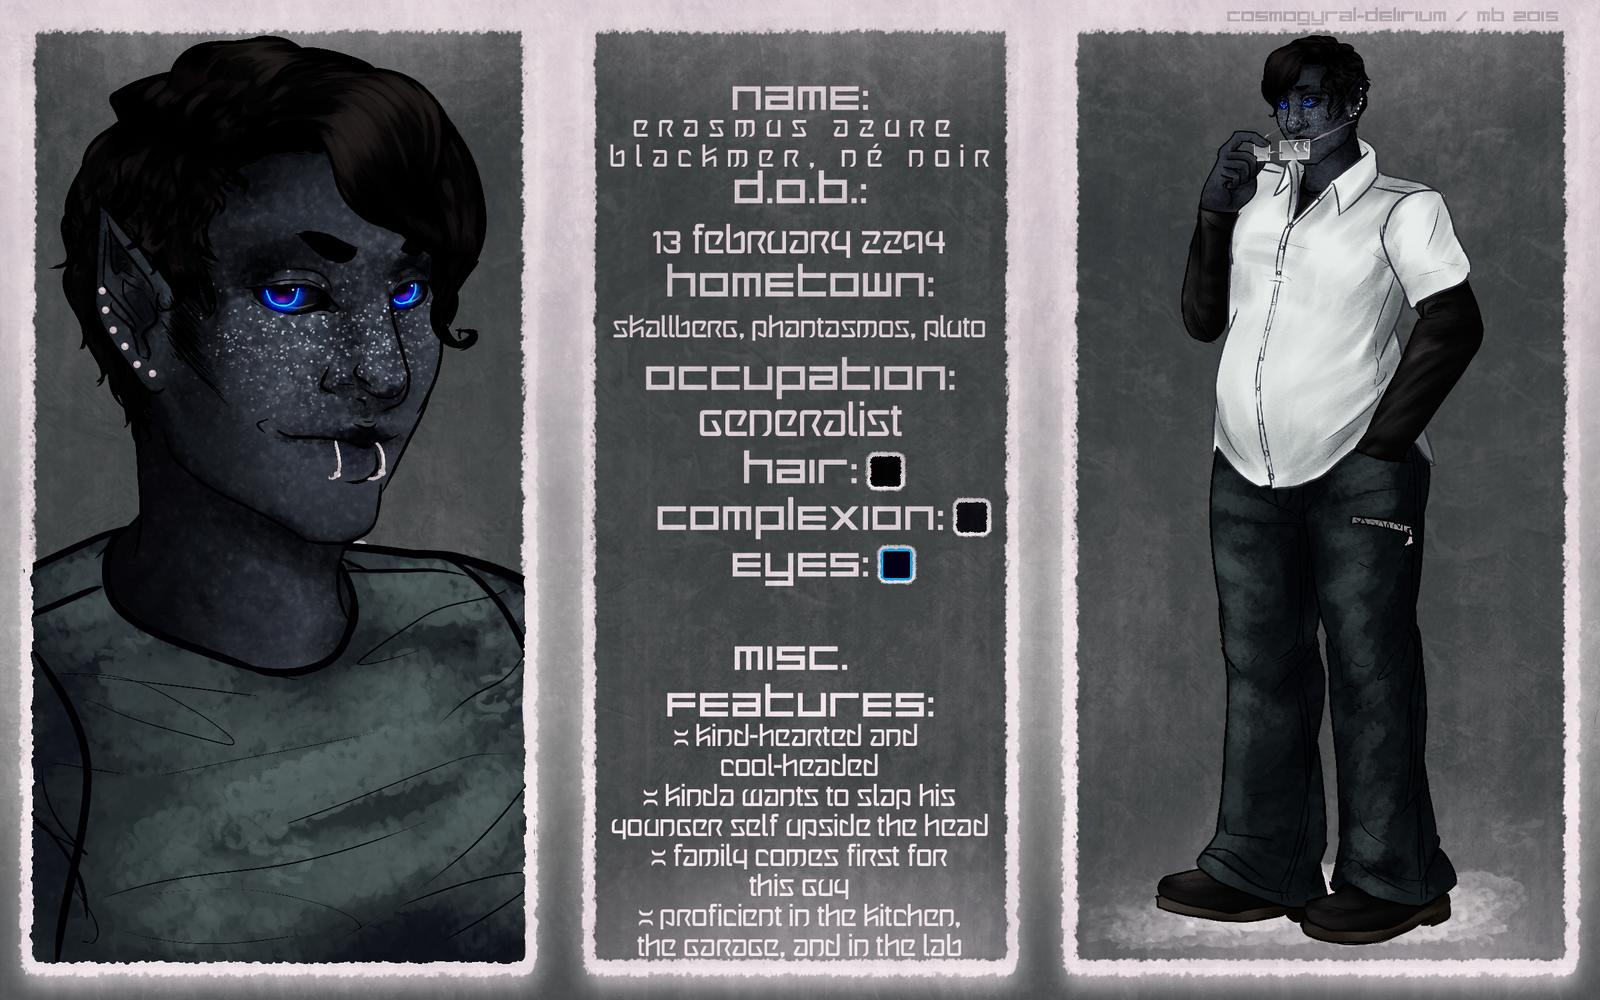 Character Sheet: Raz (Alt. Version) by cosmogyral-delirium